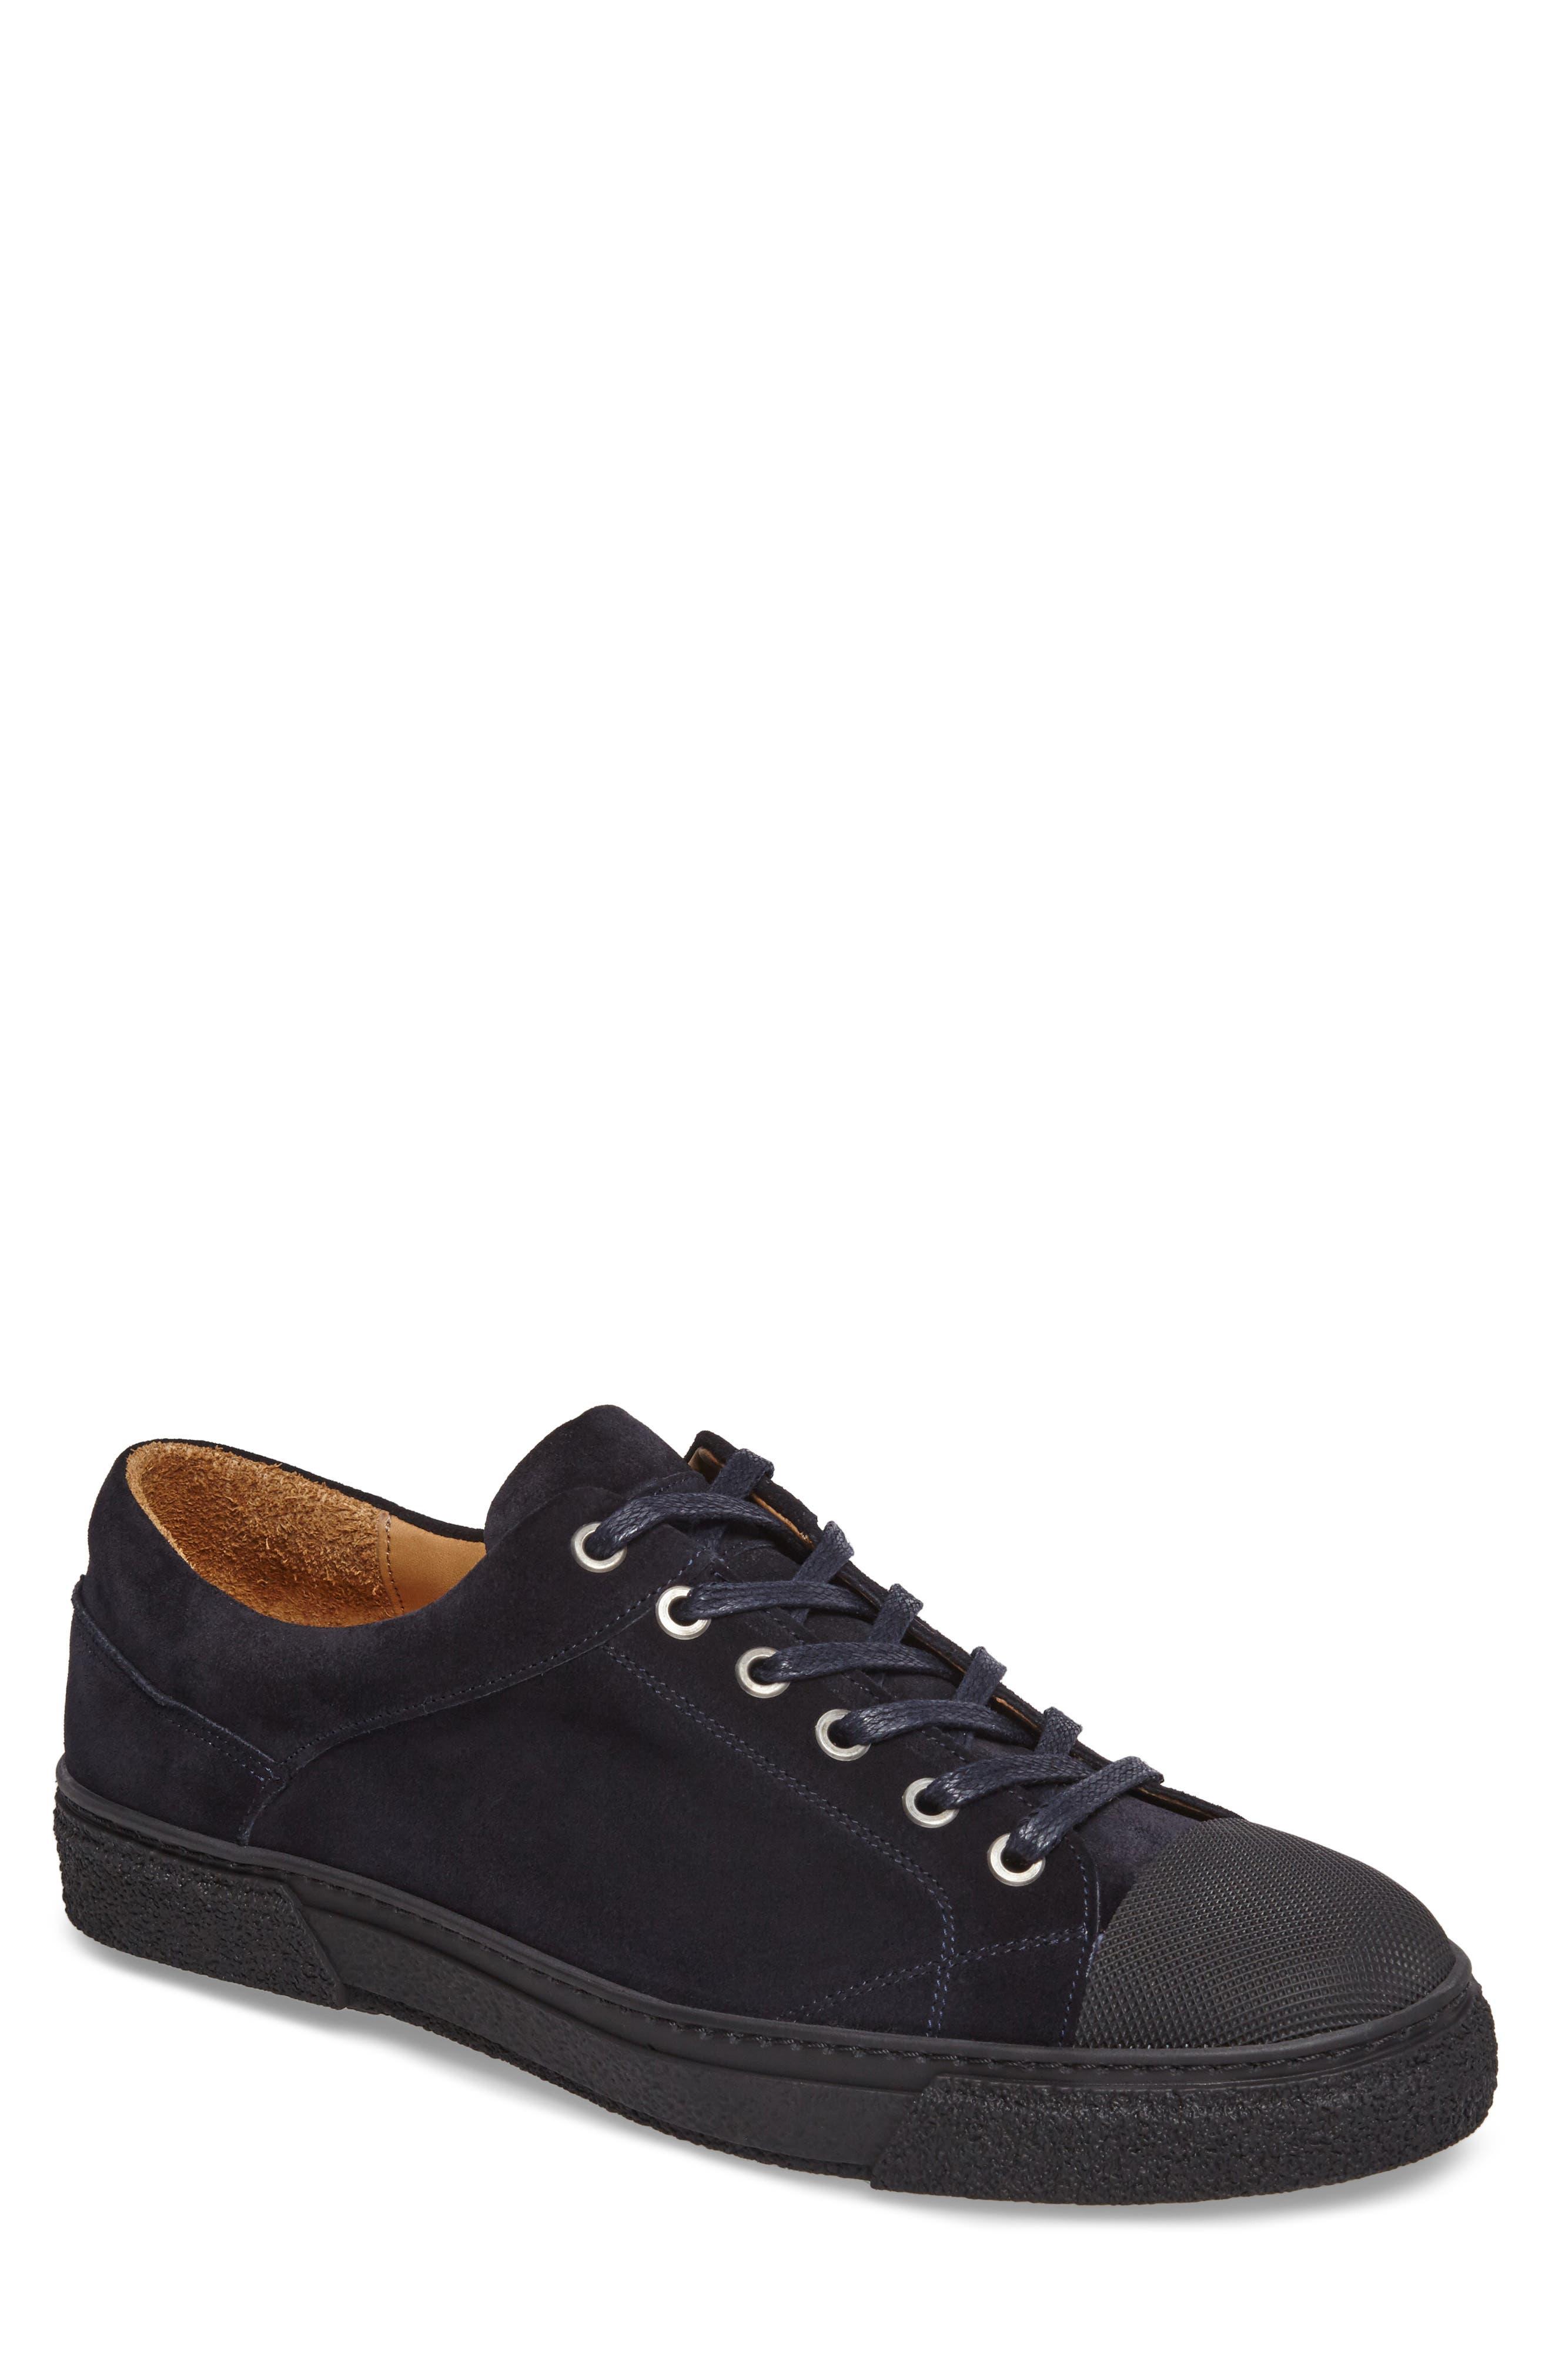 Alternate Image 1 Selected - Vince Camuto Wallsem Sneaker (Men)